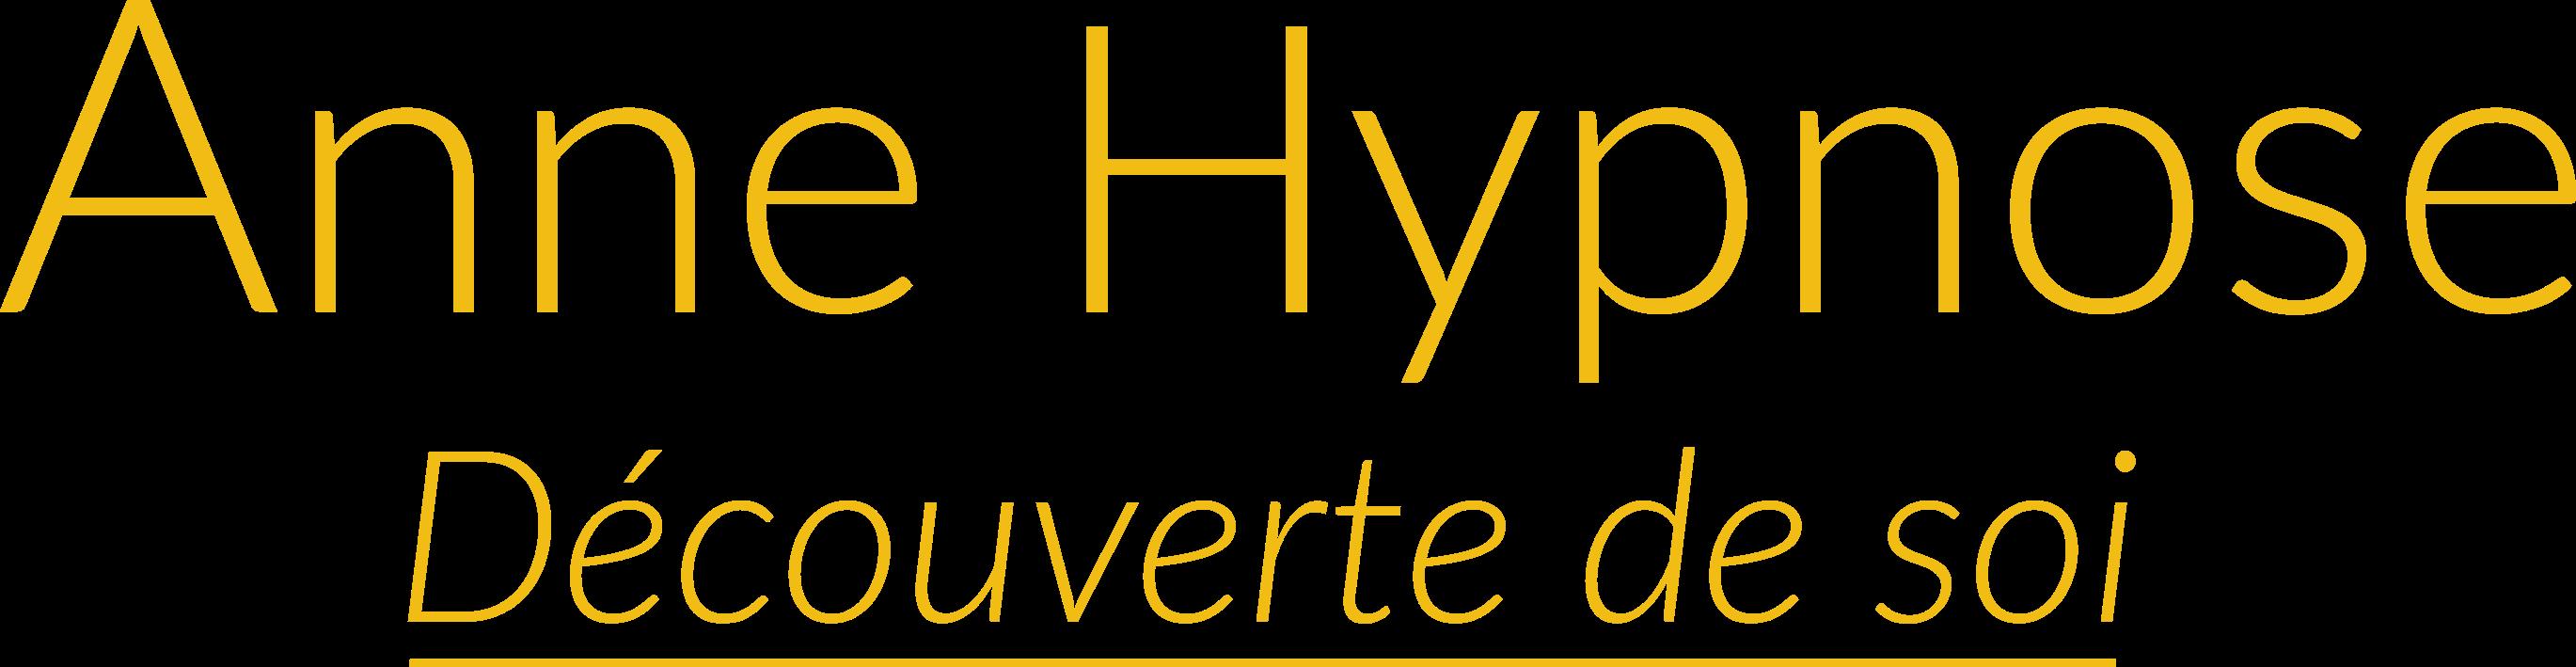 Anne Hypnose